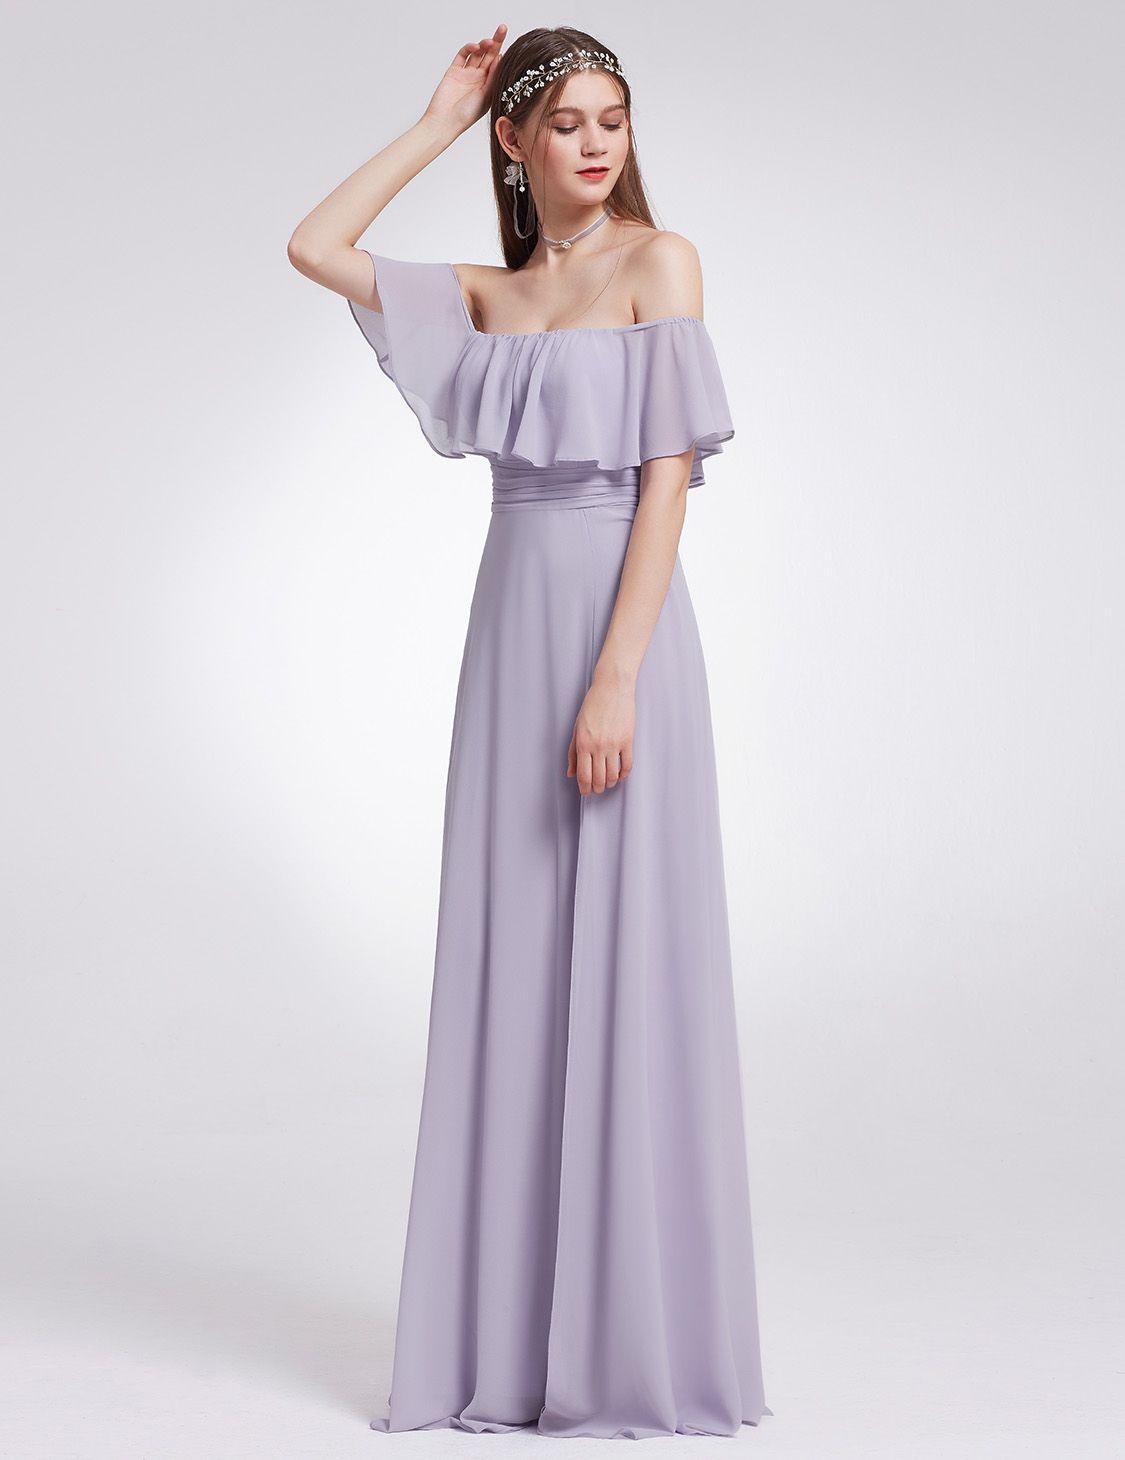 507c2ef172bd Ever-Pretty Long Bridesmaid Dresses Chiffon Off Shoulder Evening Ball Gown  07171#Dresses#Chiffon#Bridesmaid